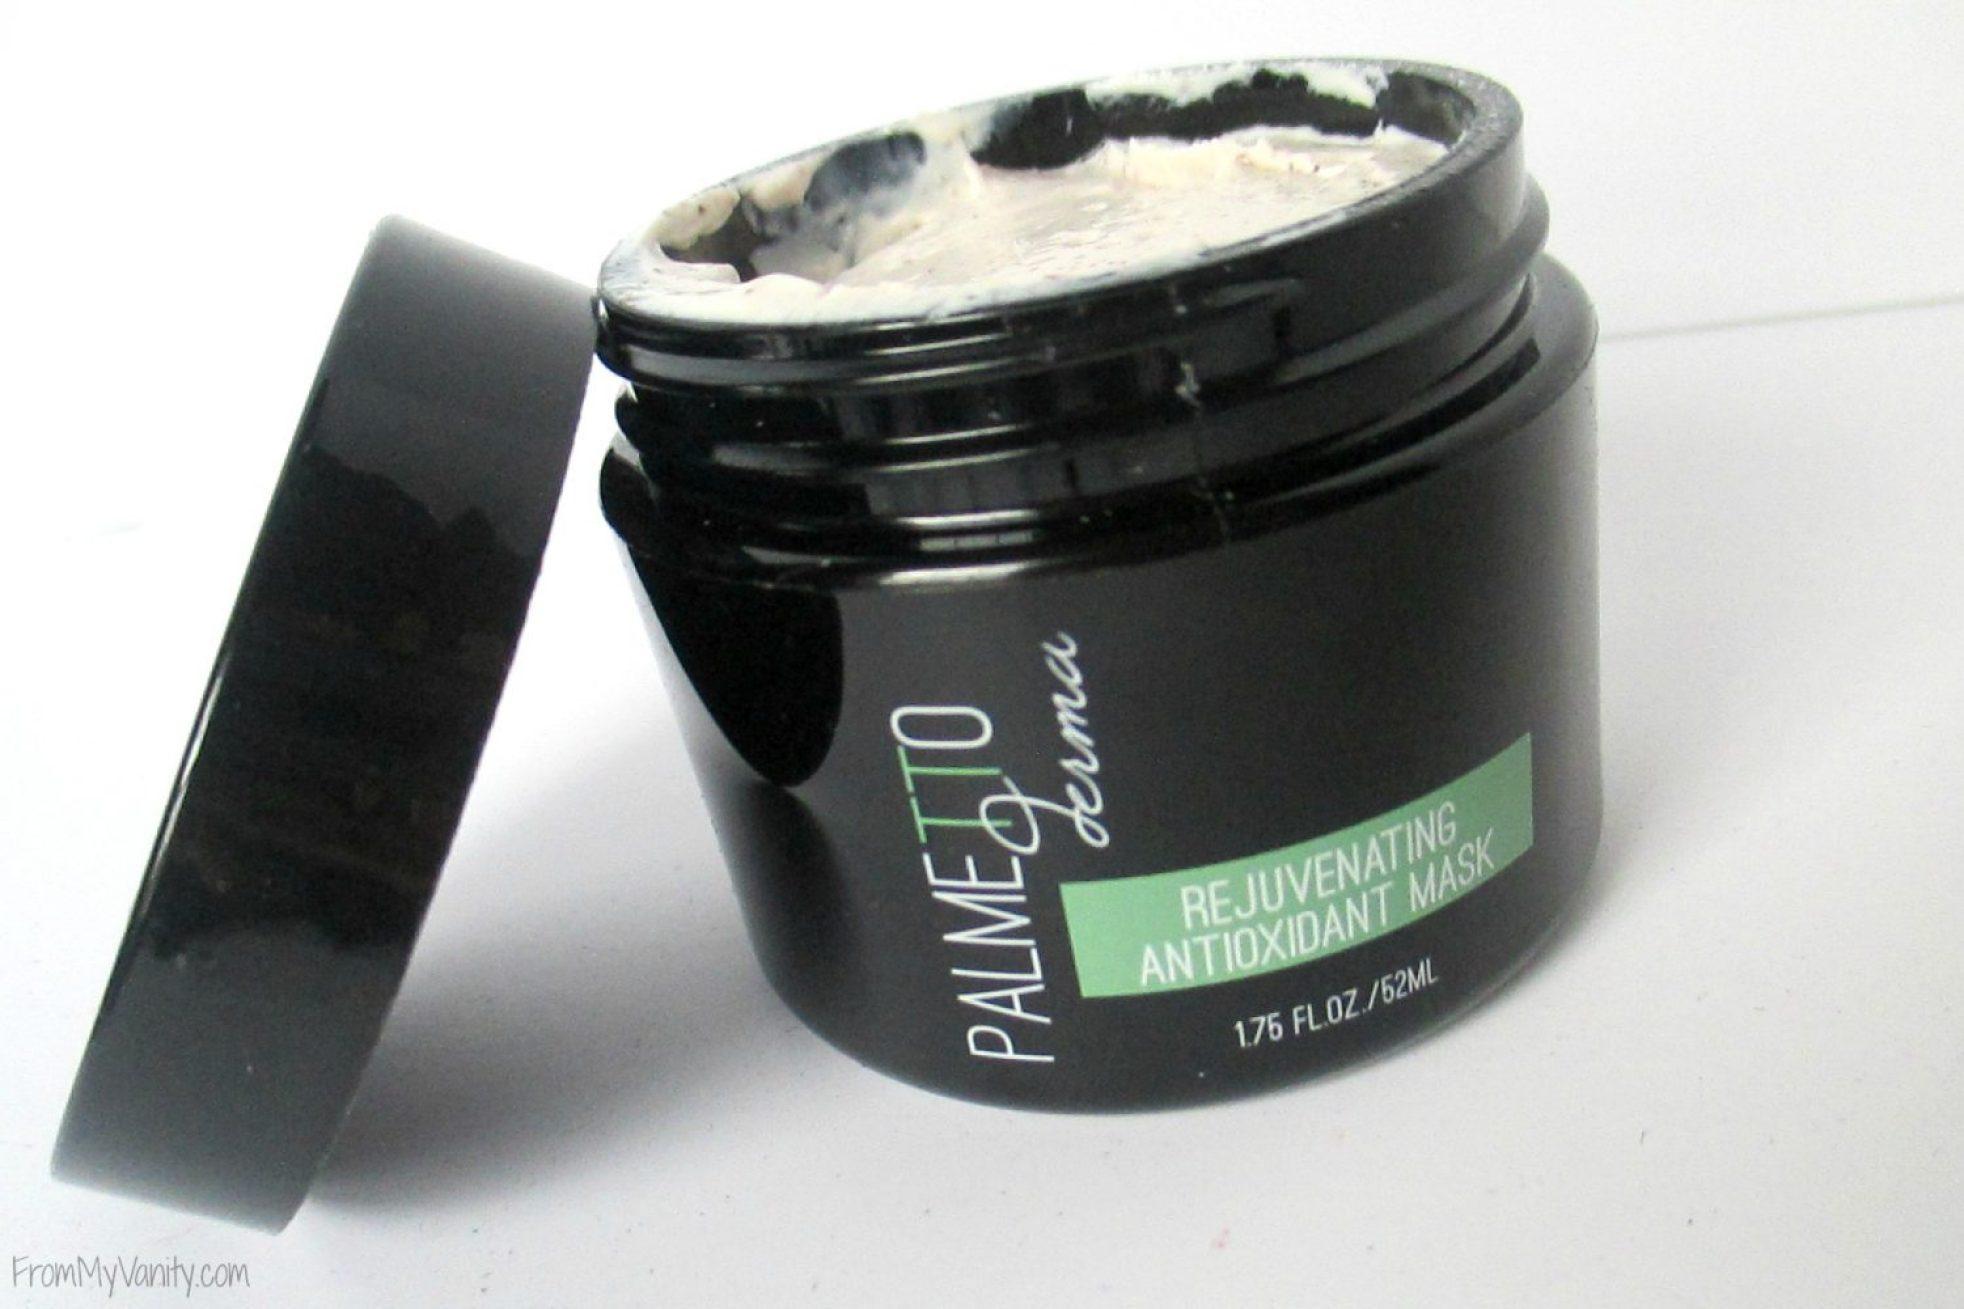 BoxyCharm's October Unboxing & Mini Reviews // Palmetto Derma Rejuvenating Antioxidant Mask // #BoxyCharm FromMyVanity.com